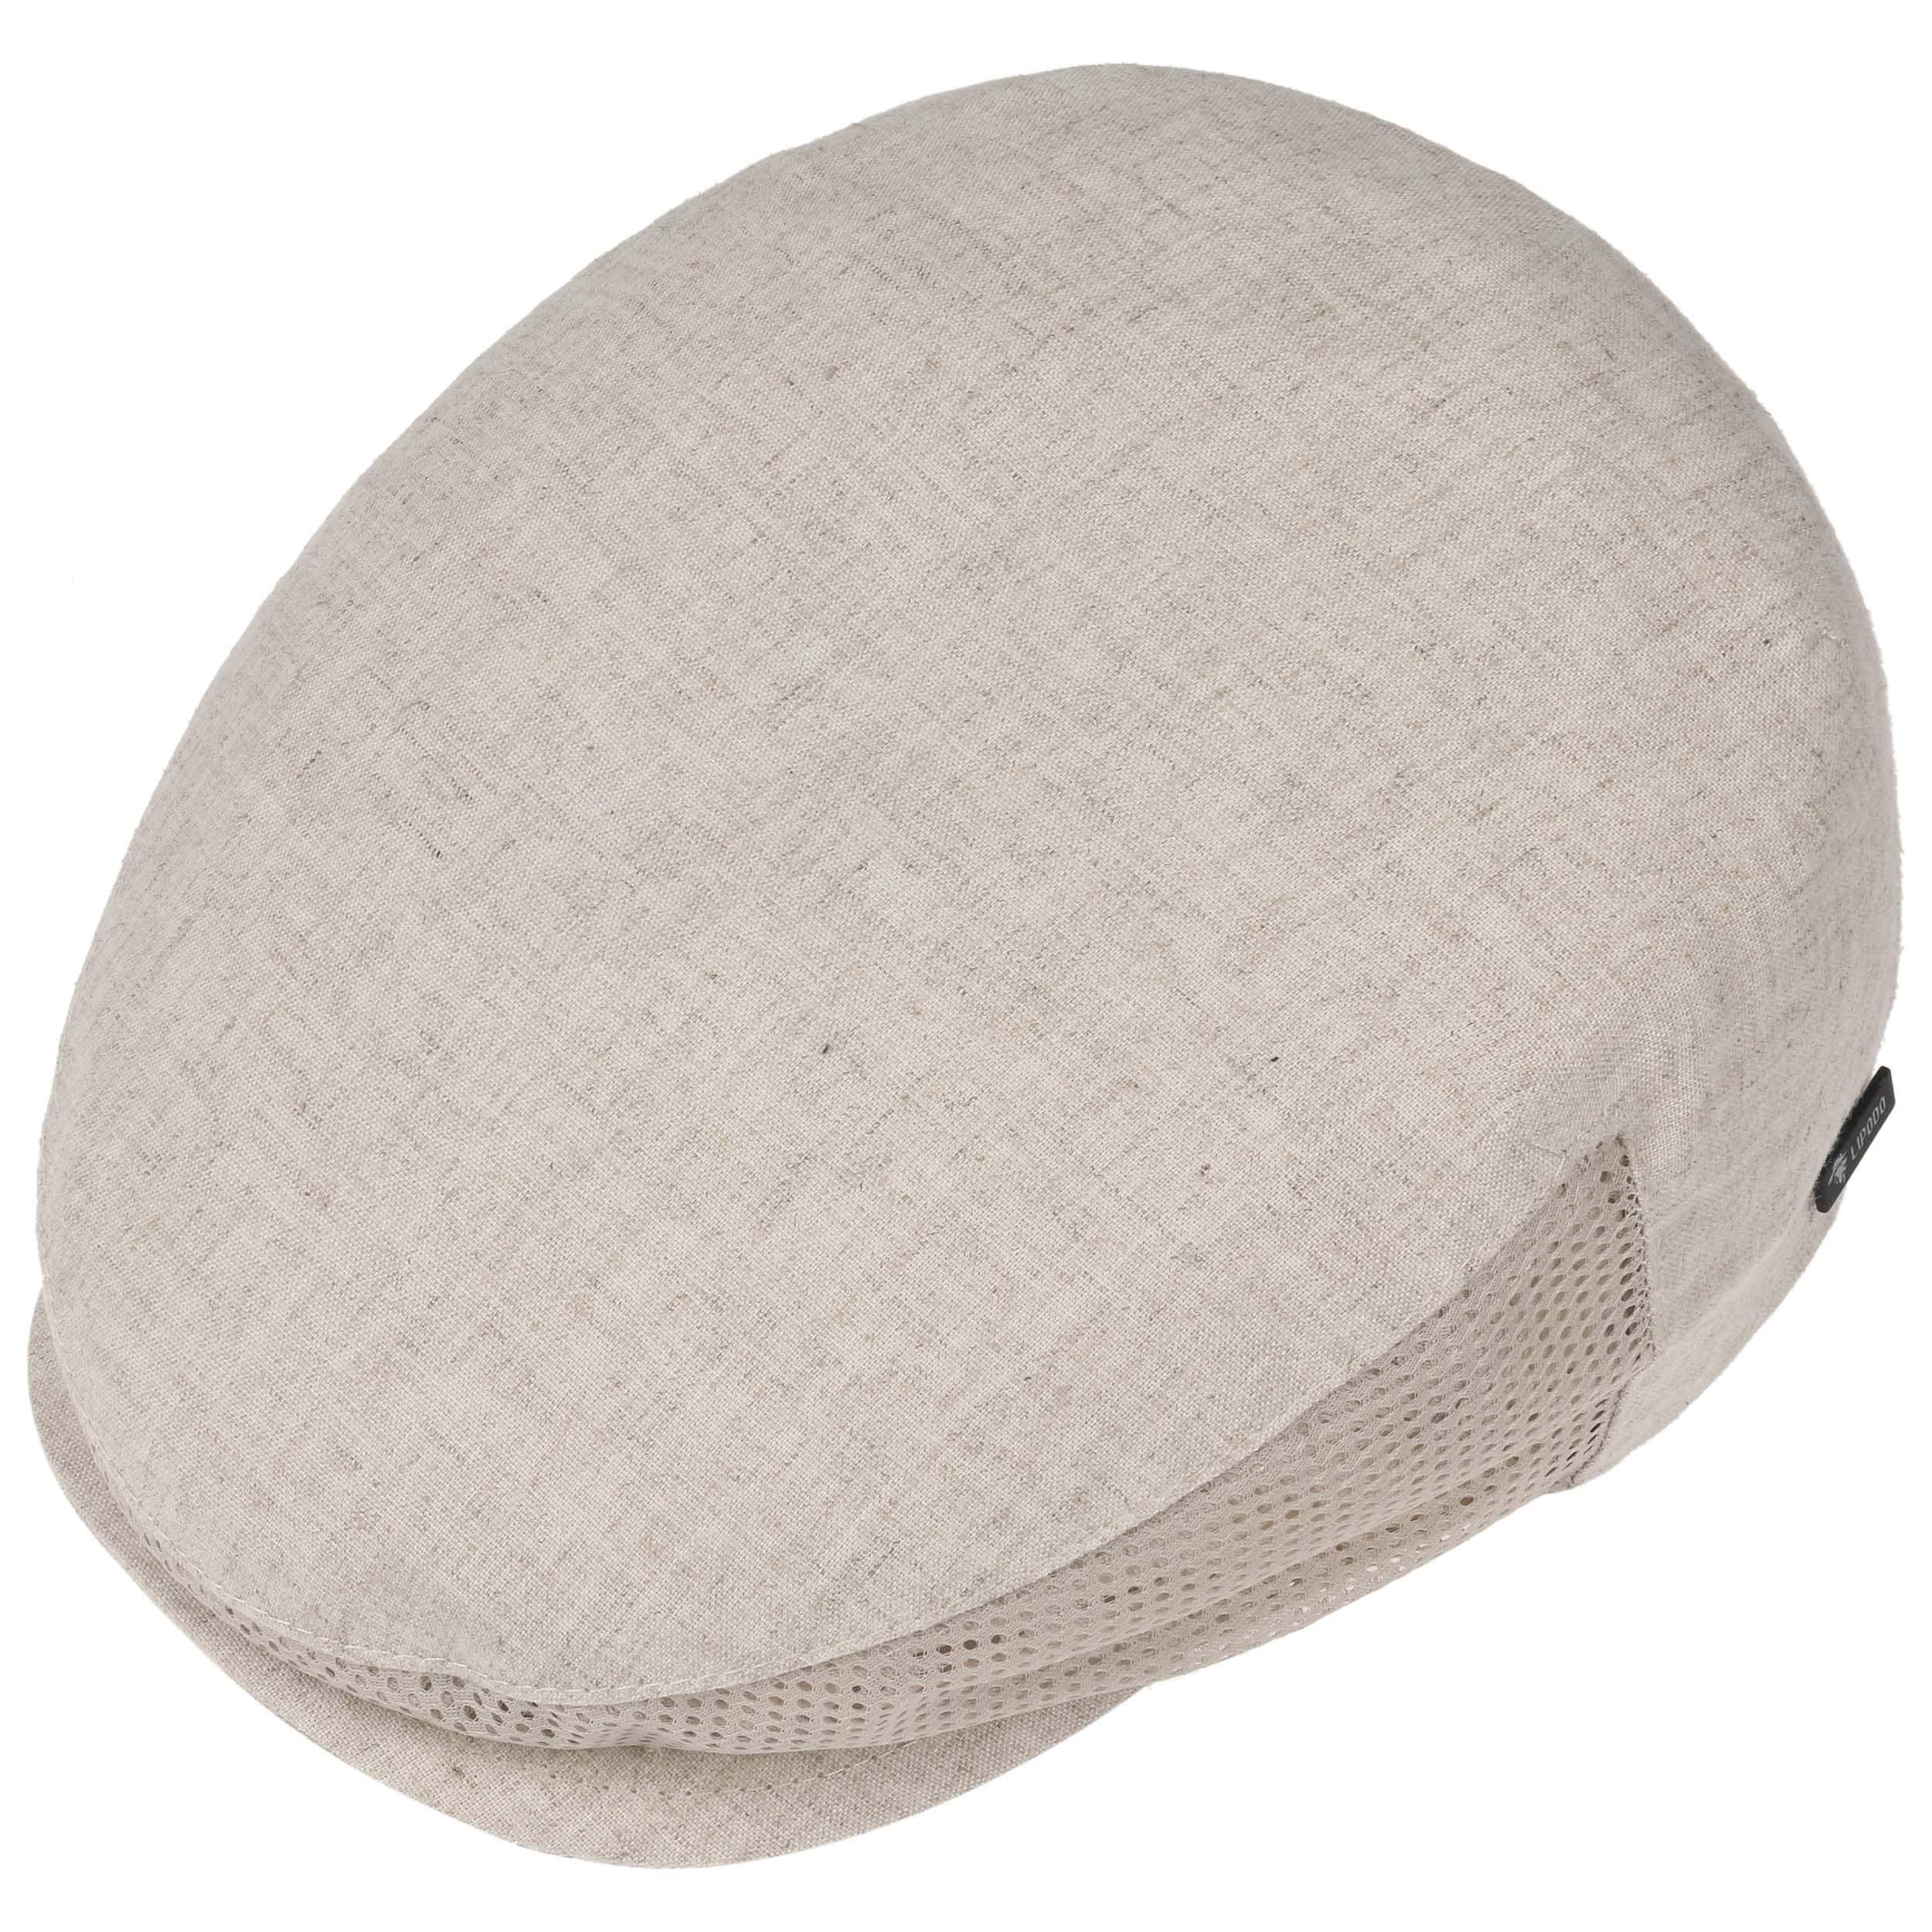 Gorra de Lino Mesh by Lipodo - Gorras - sombreroshop.es 89b2bbaf414d